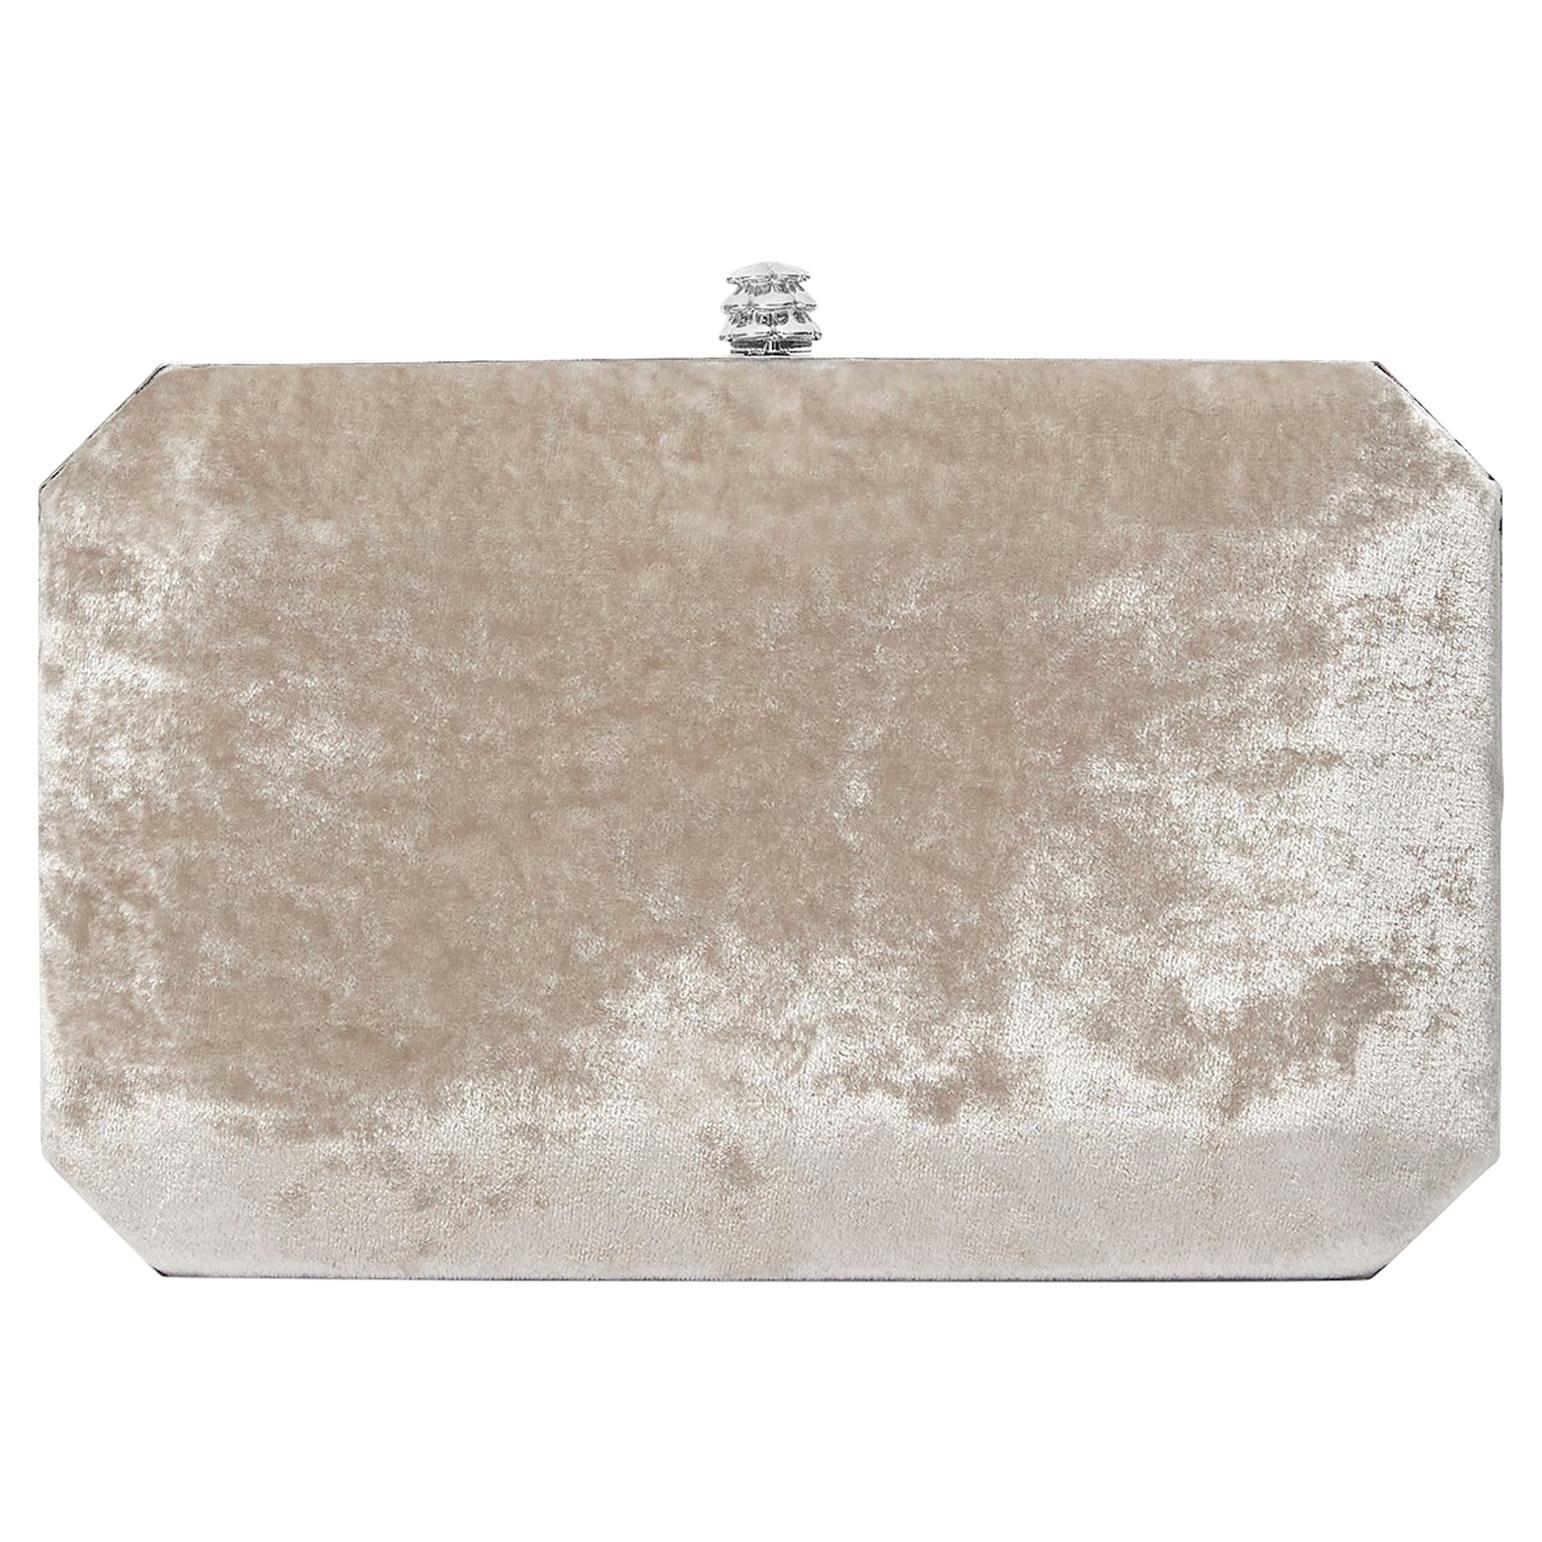 TYLER ELLIS Lily Clutch Silver-Gold Crushed Velvet Silver Hardware